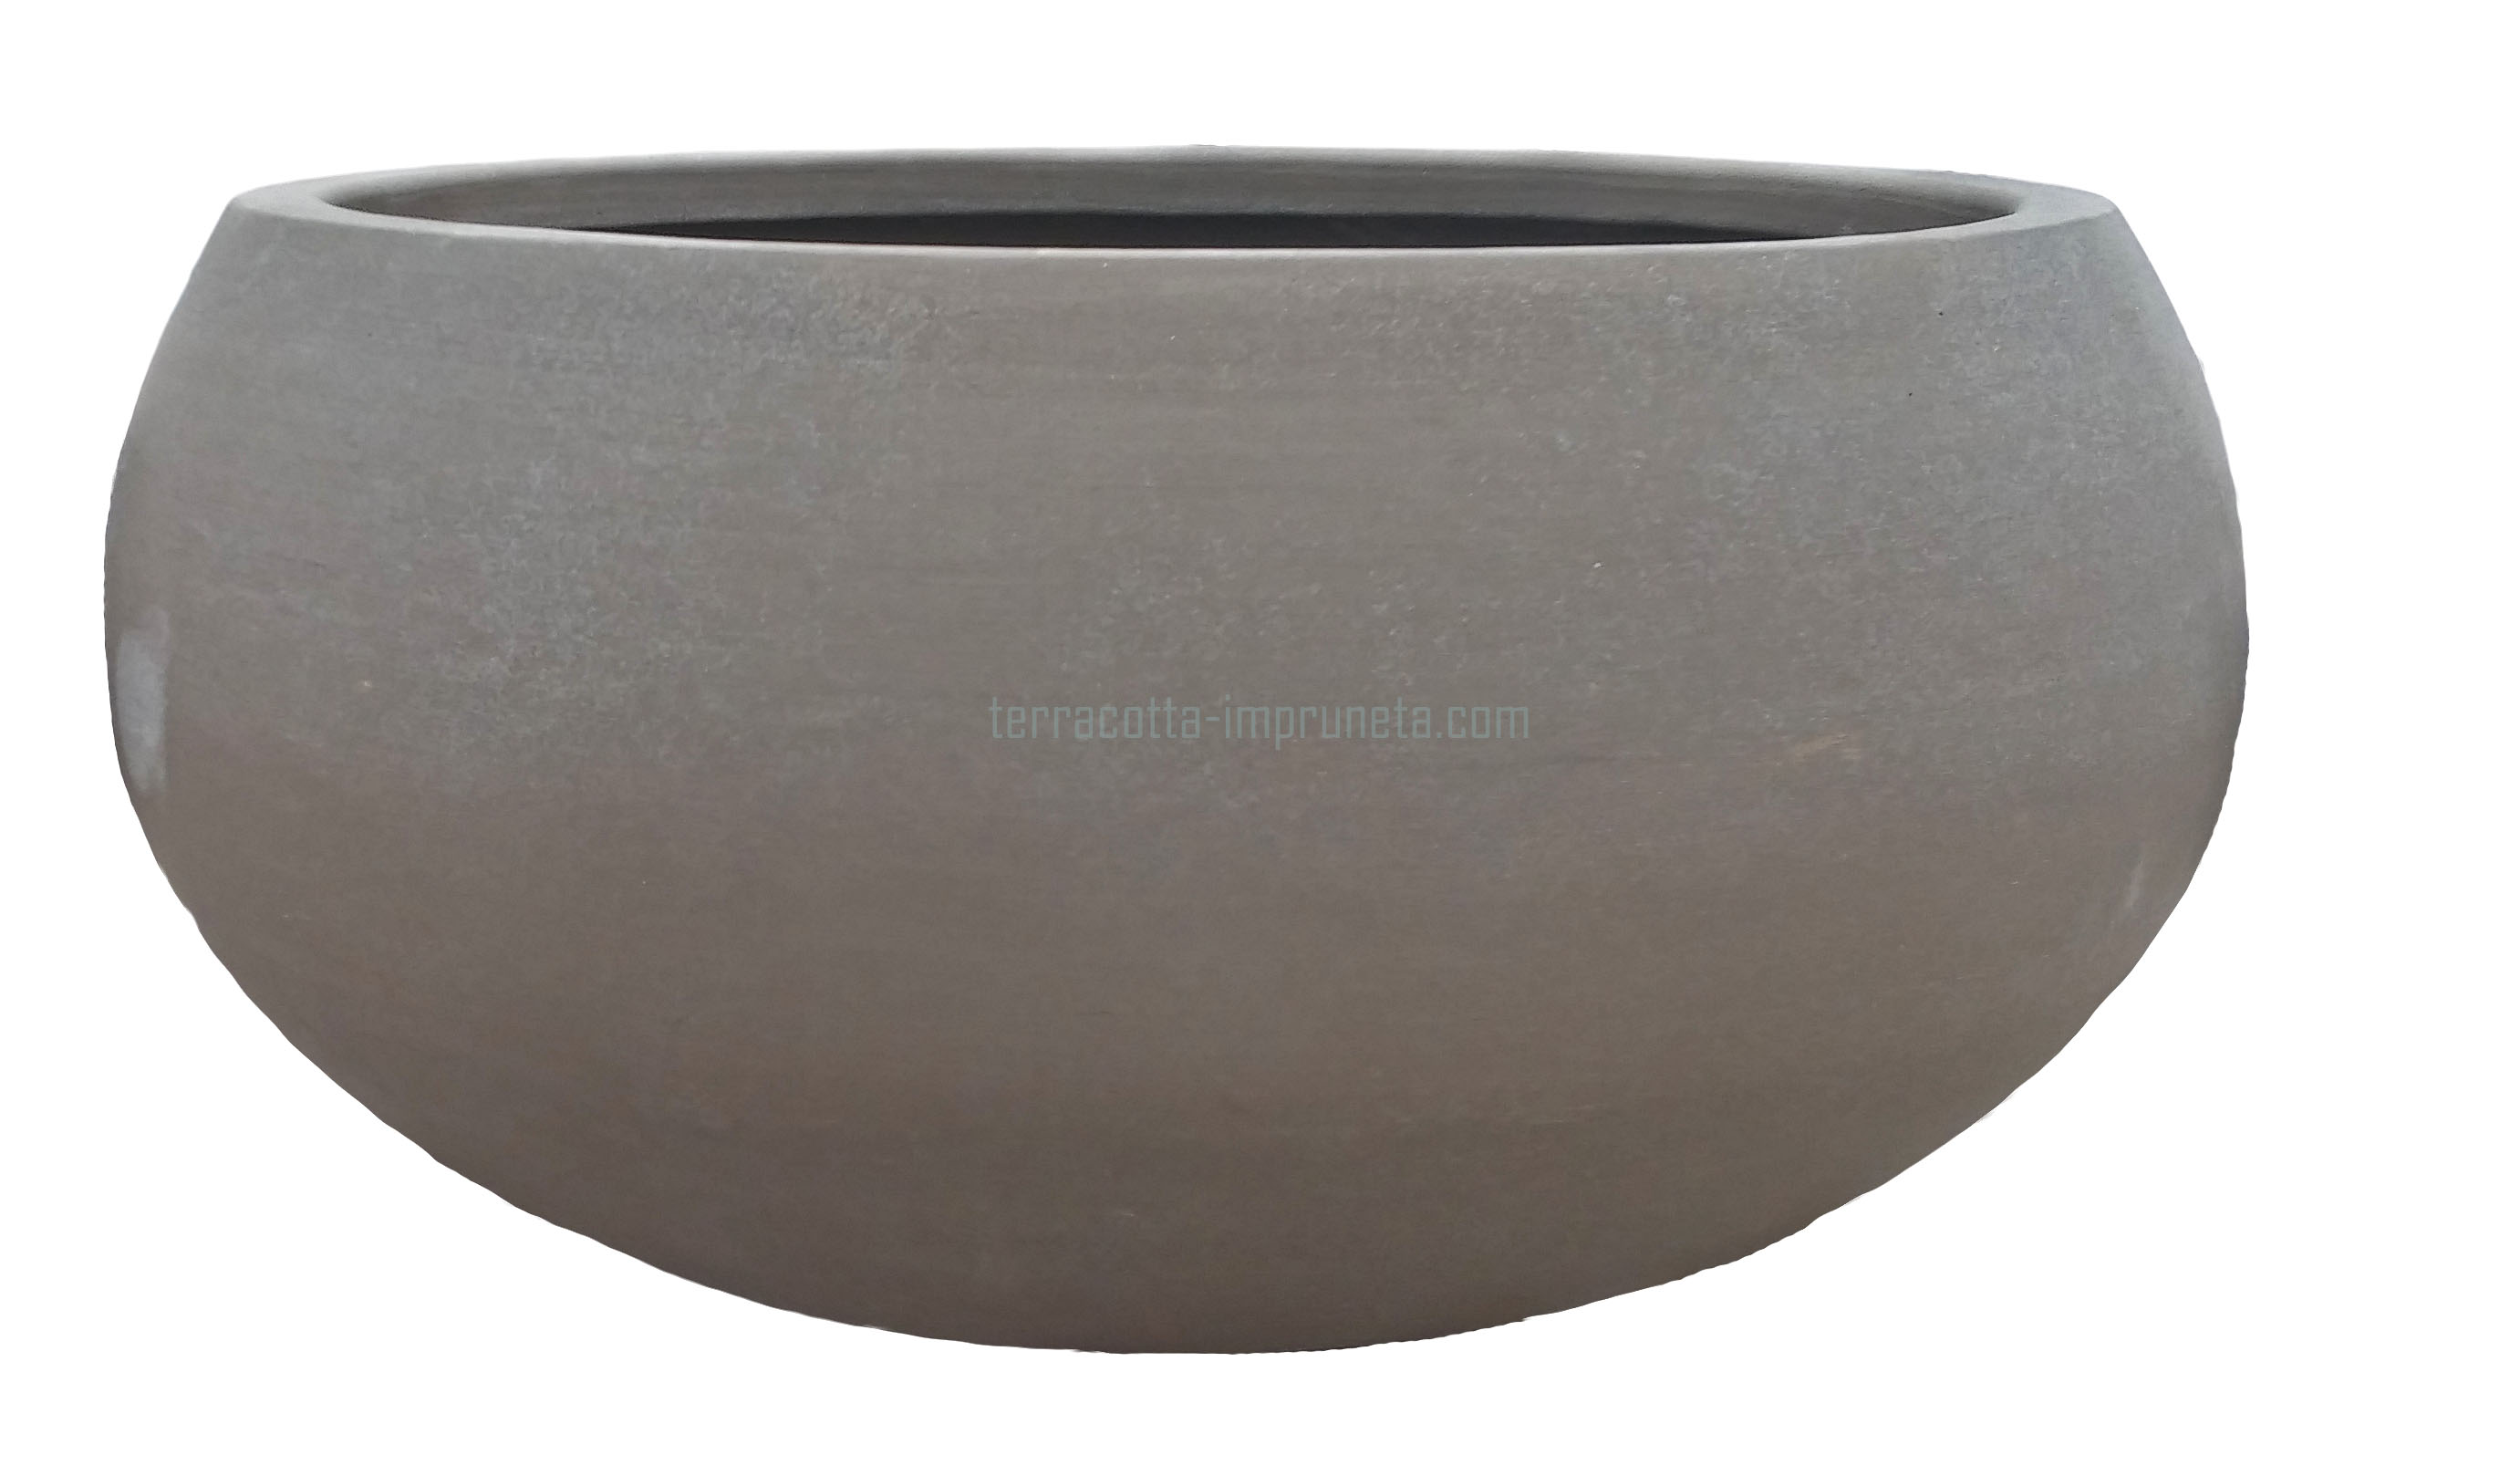 term hlen terracotta impruneta terracotta schale ohne rand. Black Bedroom Furniture Sets. Home Design Ideas